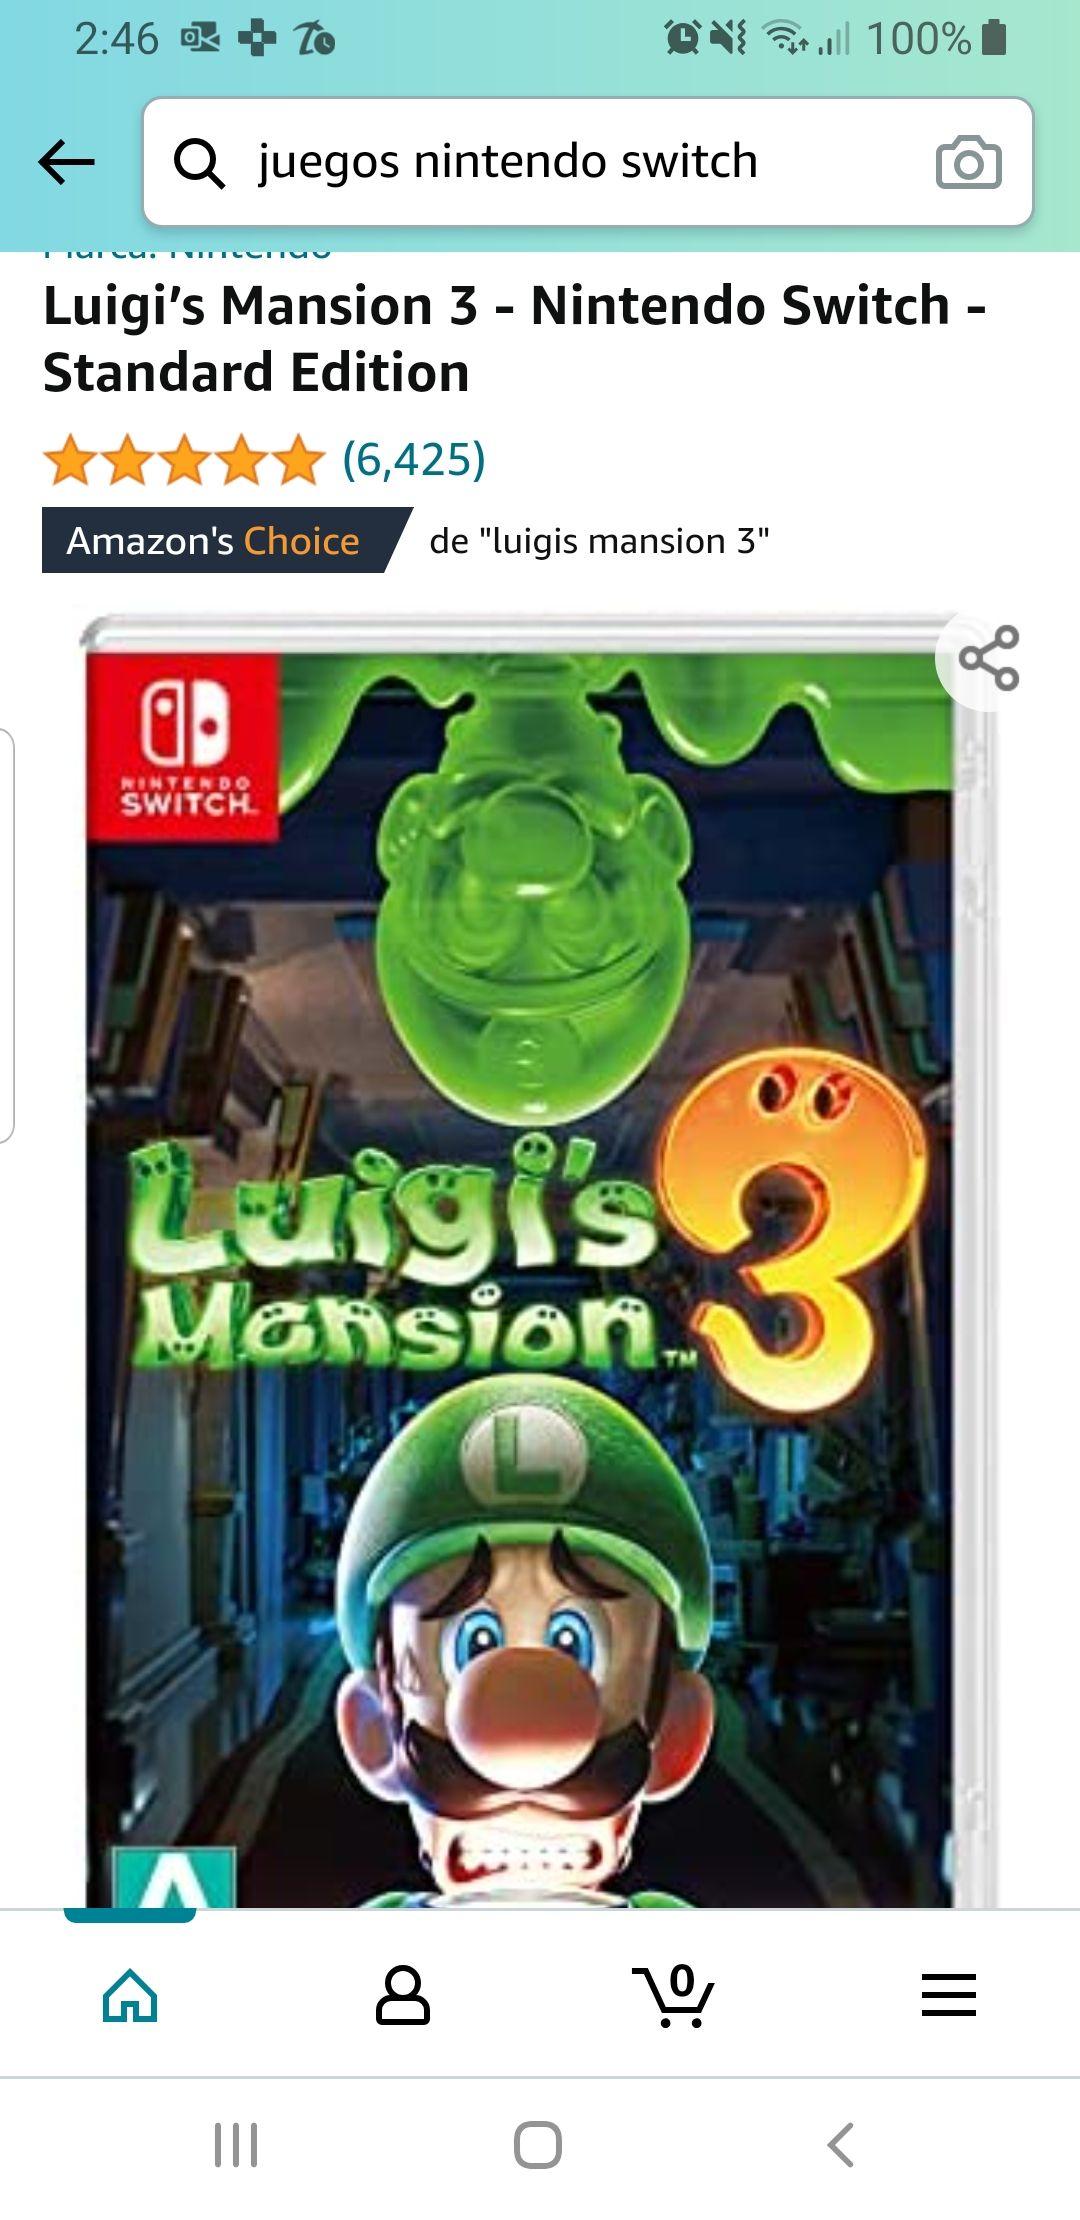 Amazon: Luigi's Mansion 3 - Nintendo Switch - Standard Edition